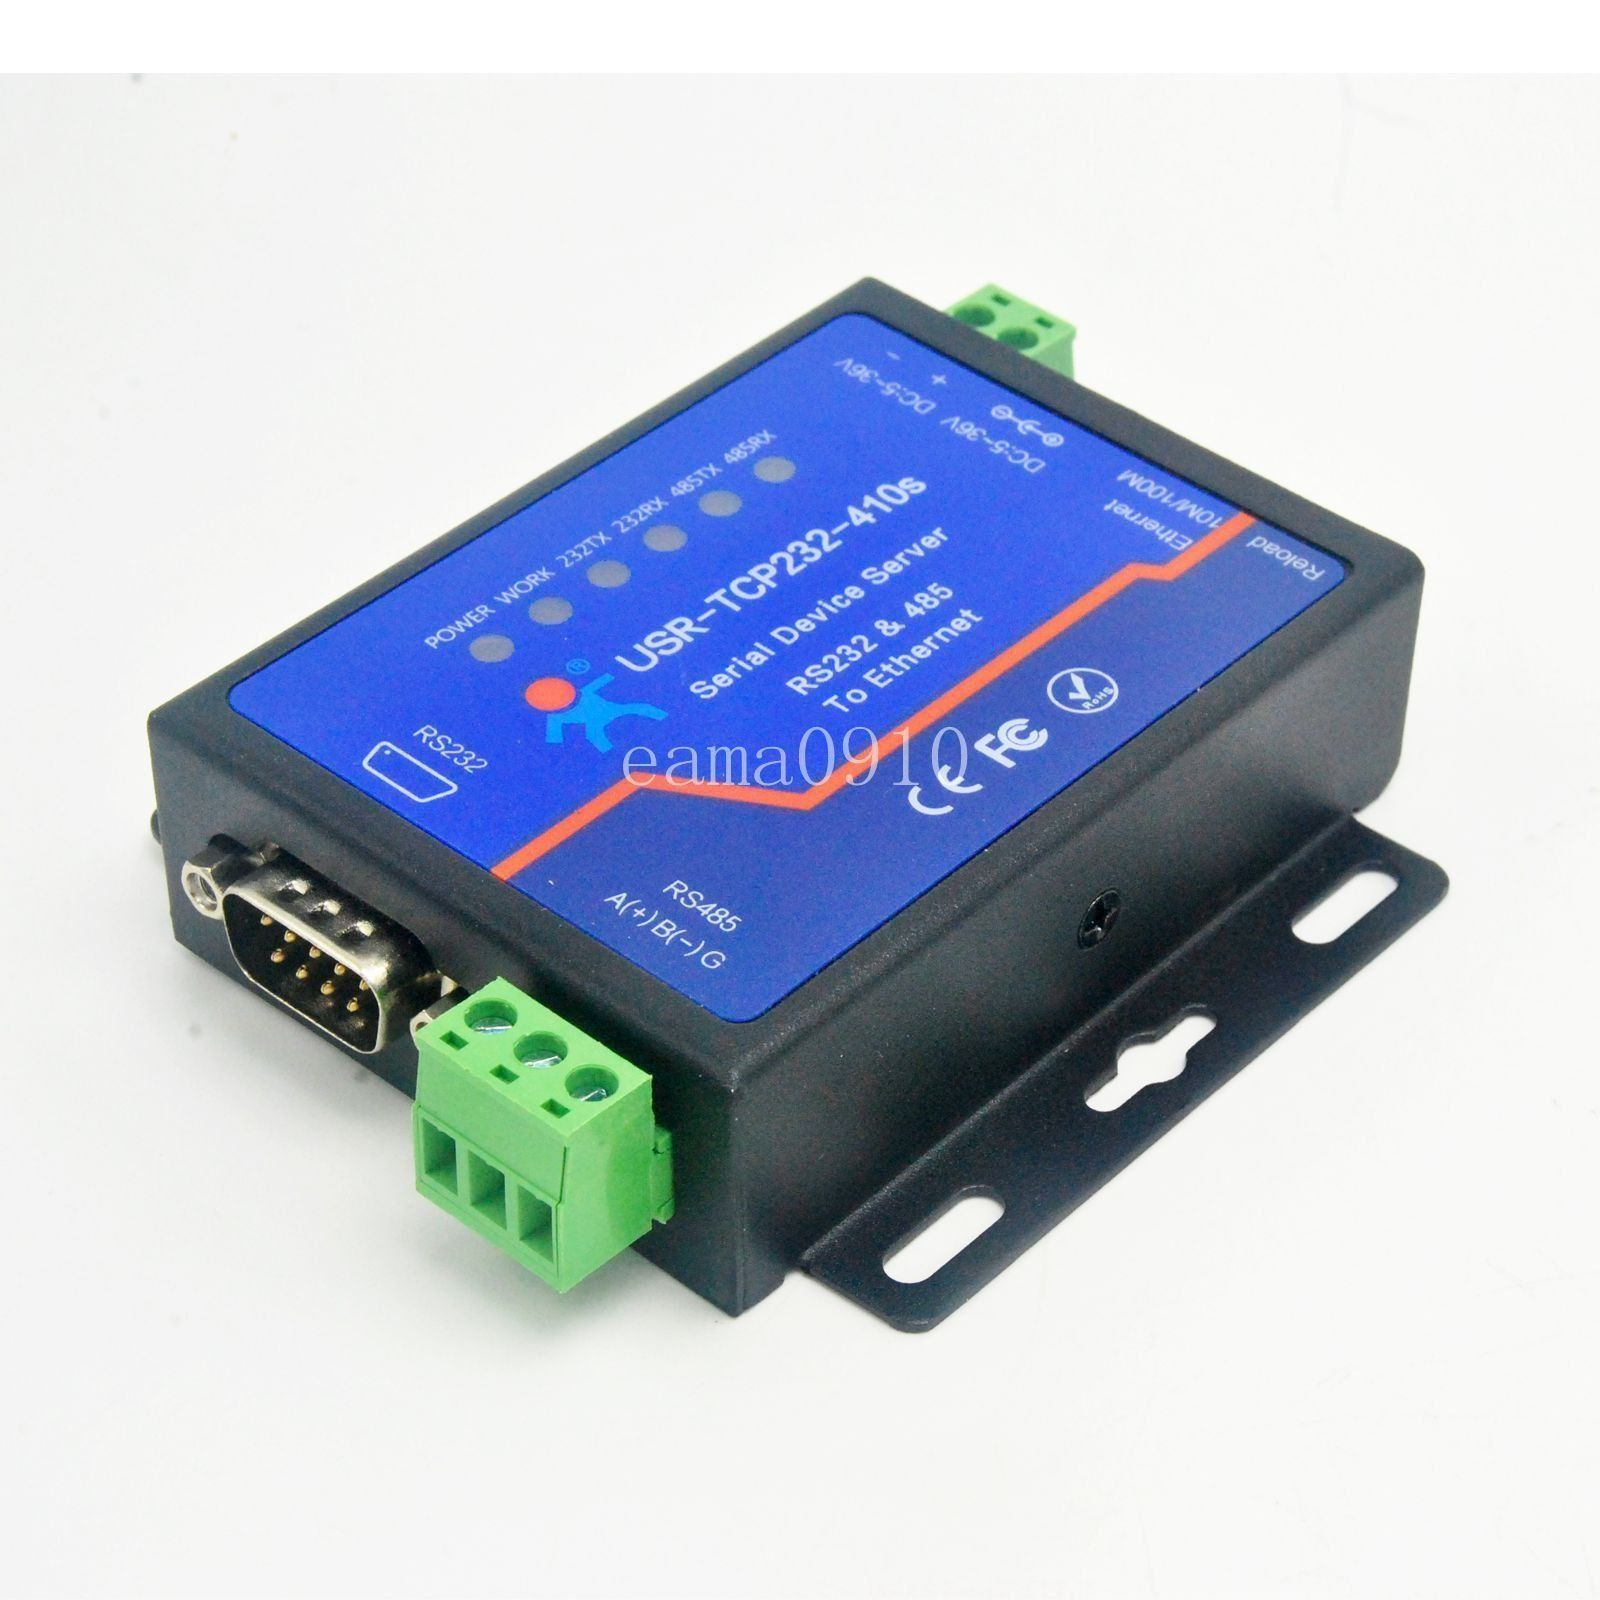 Analogtodigital Converters Information Engineering360